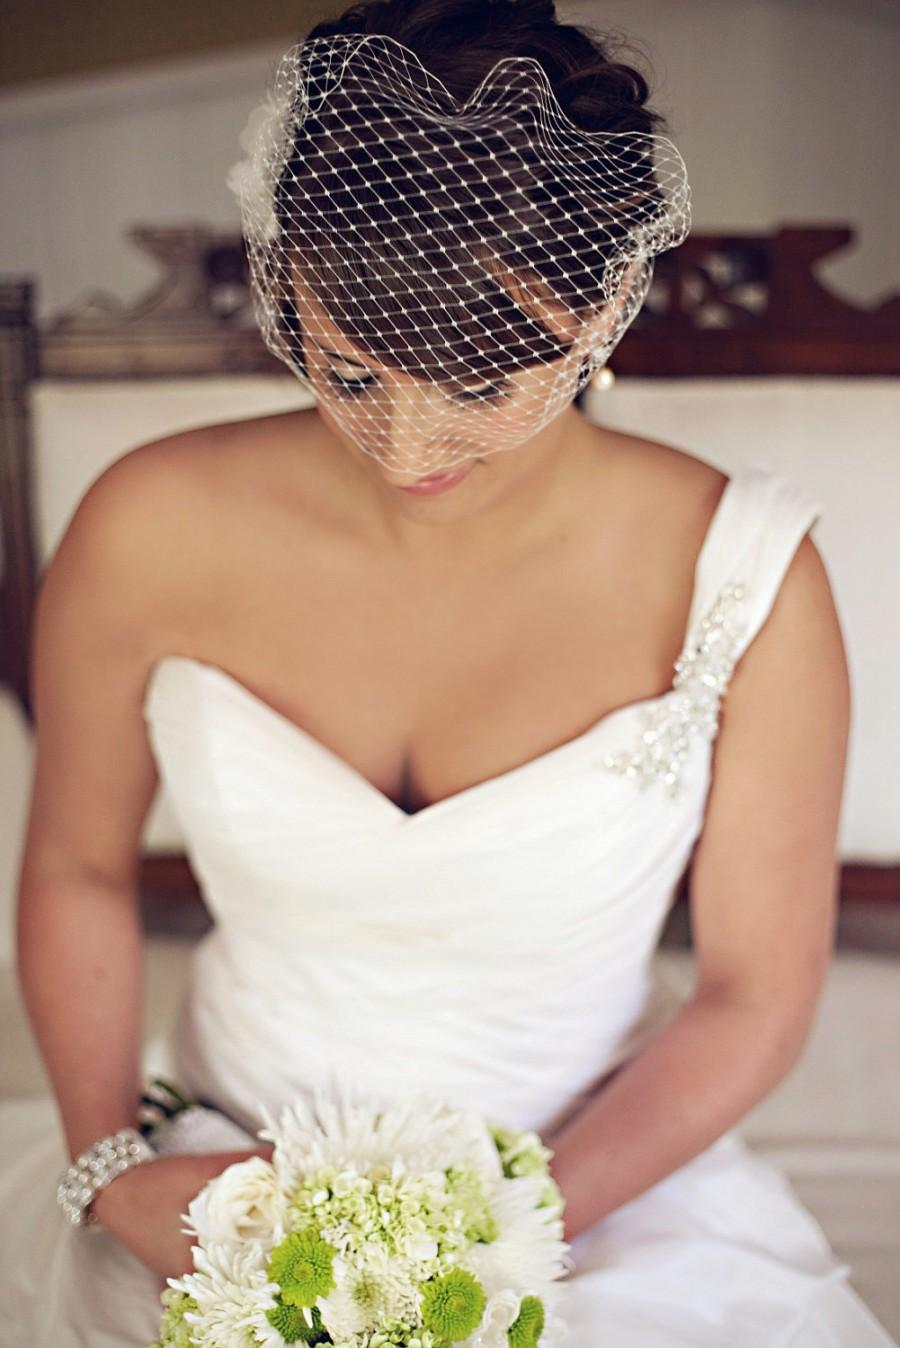 Mariage - Bandeau Birdcage Veil, Birdcage Veil, Bridal Veil, White, Off White, Ivory, Blush Pink, Champagne -Style 102